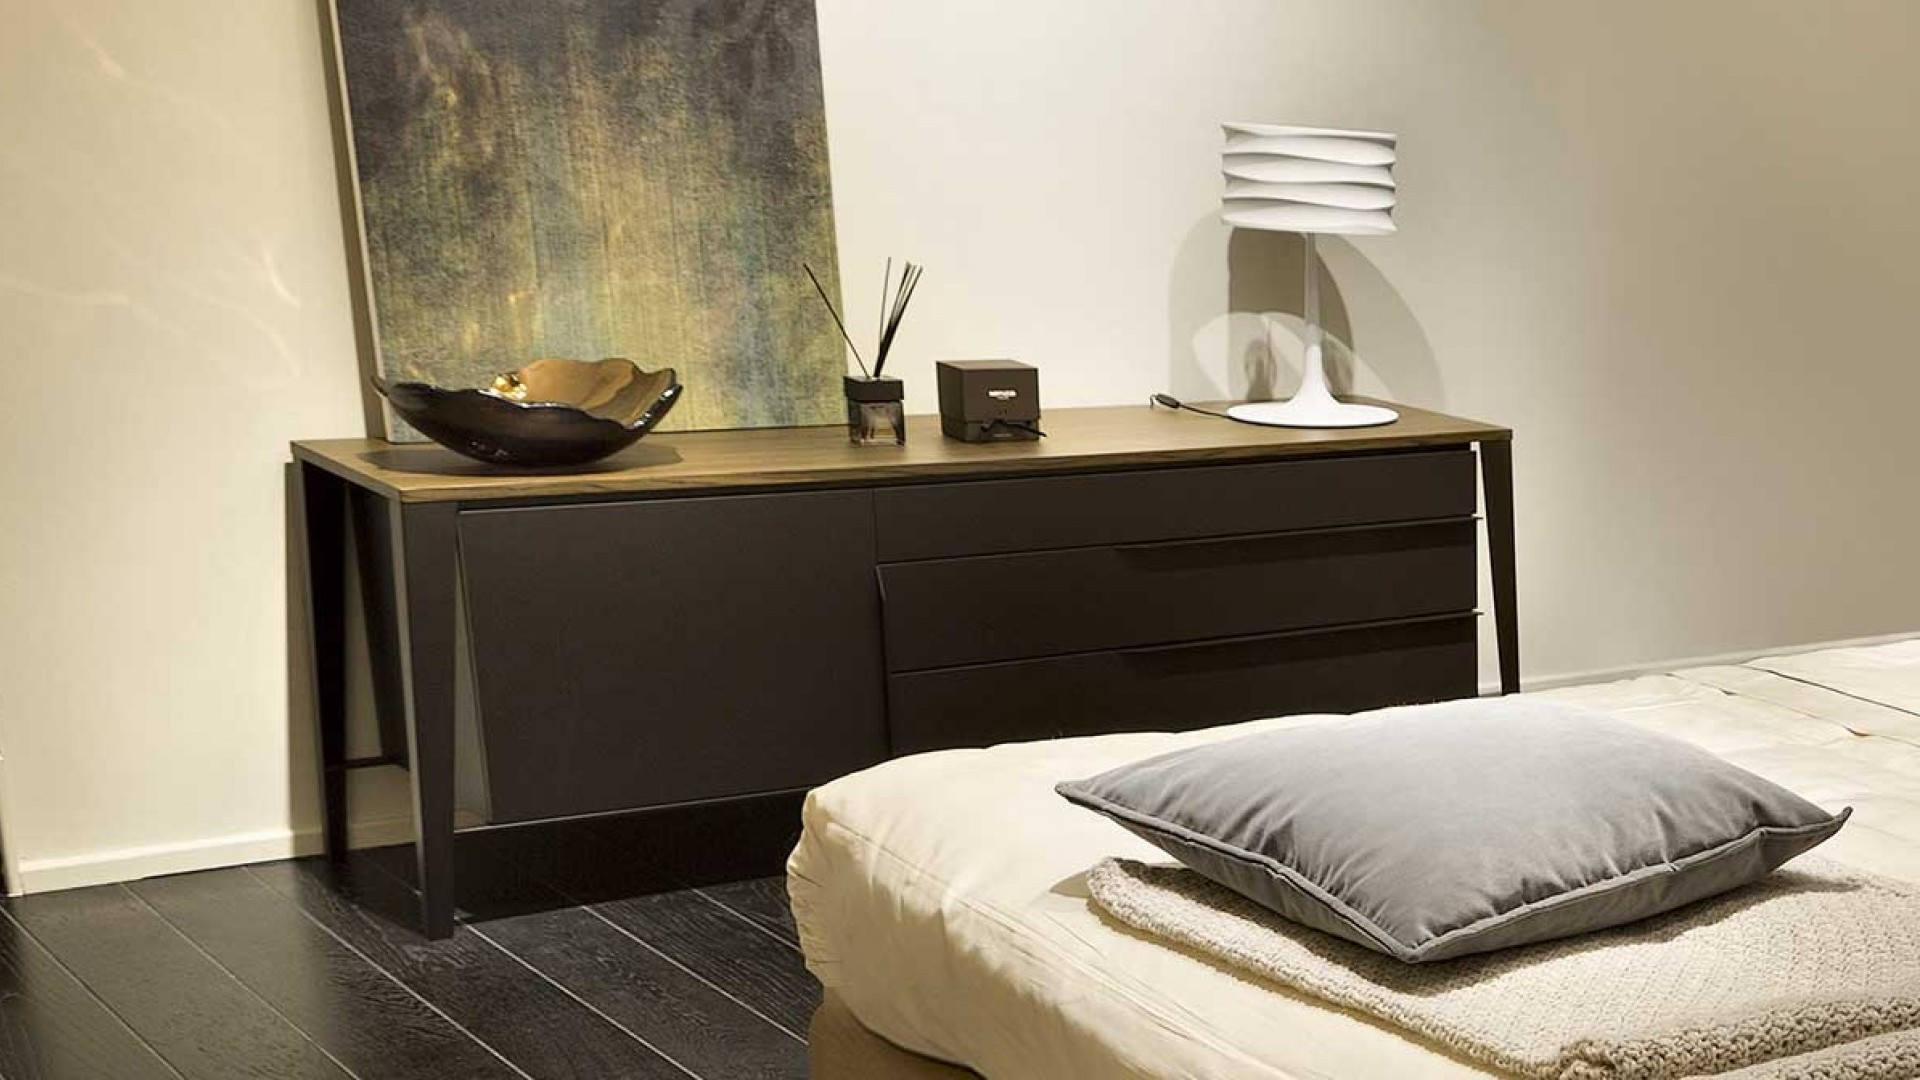 Euclide  Night & day furniture